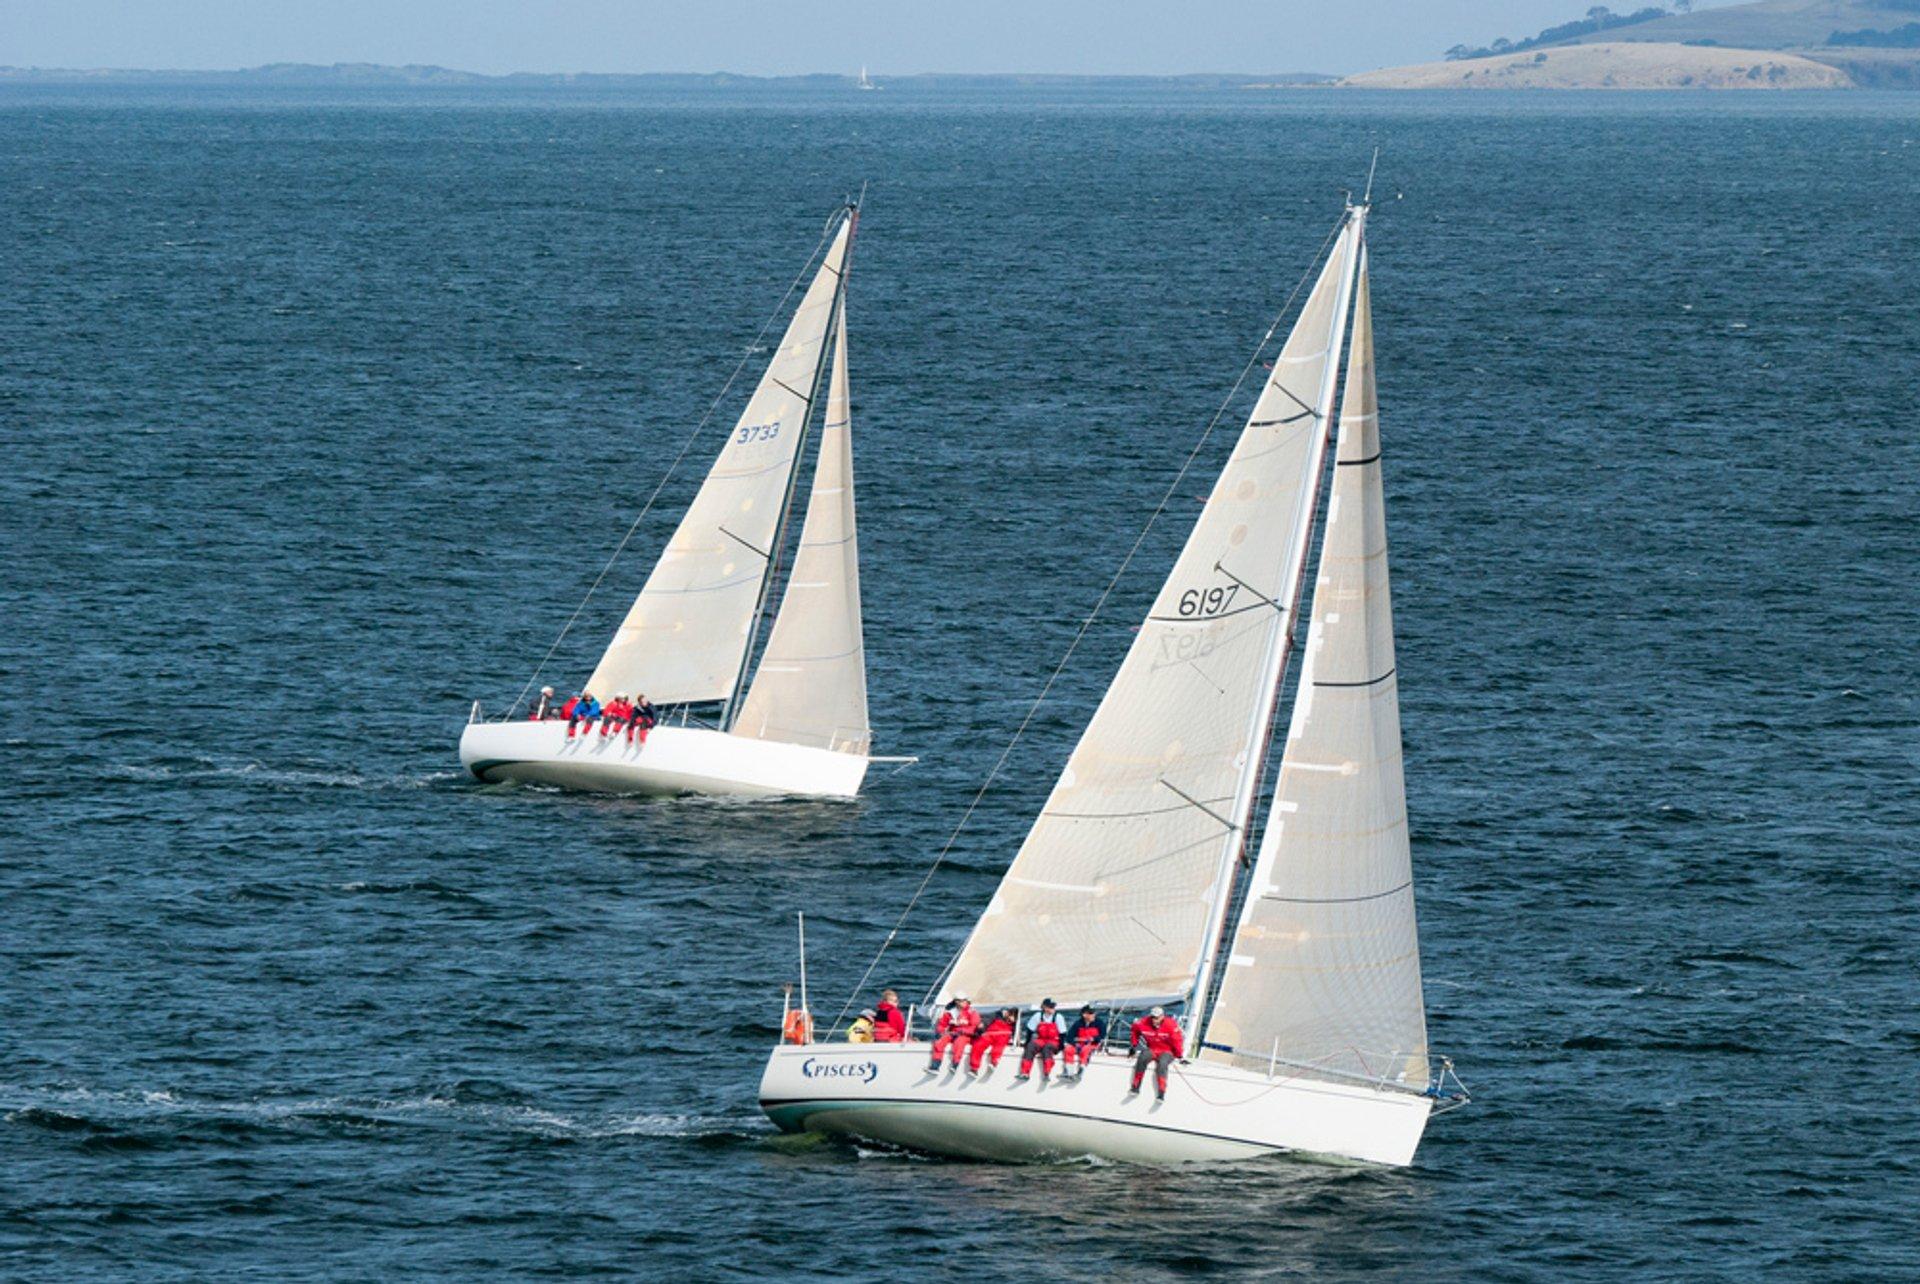 Yachting Season in Tasmania - Best Season 2019